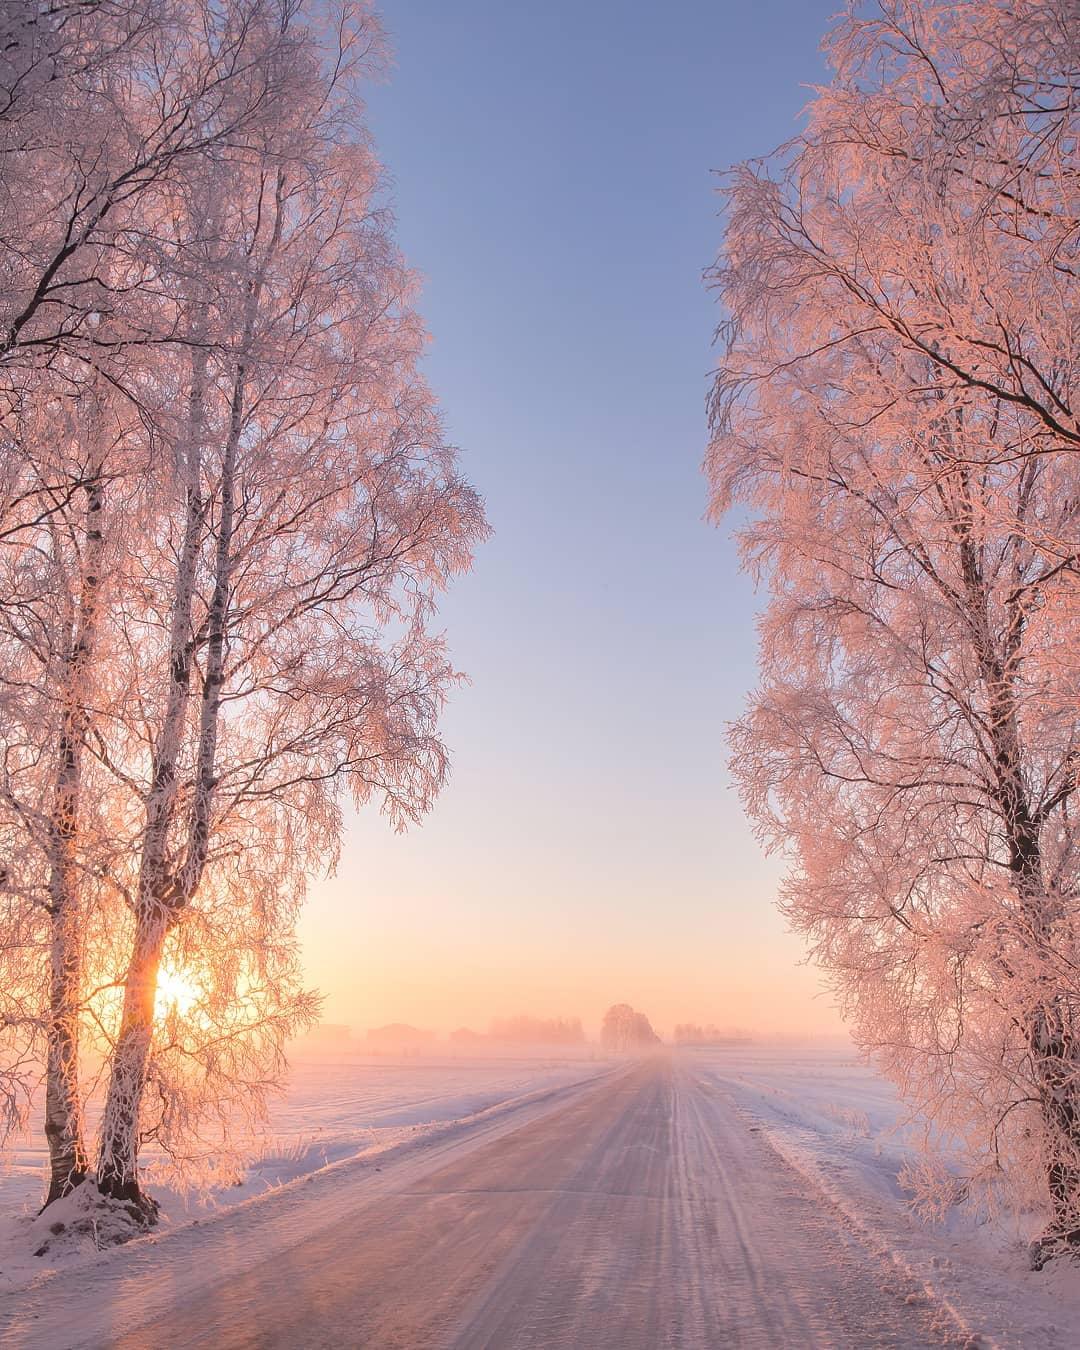 Зимняя природа Финляндии на снимках Юкка Рисикко